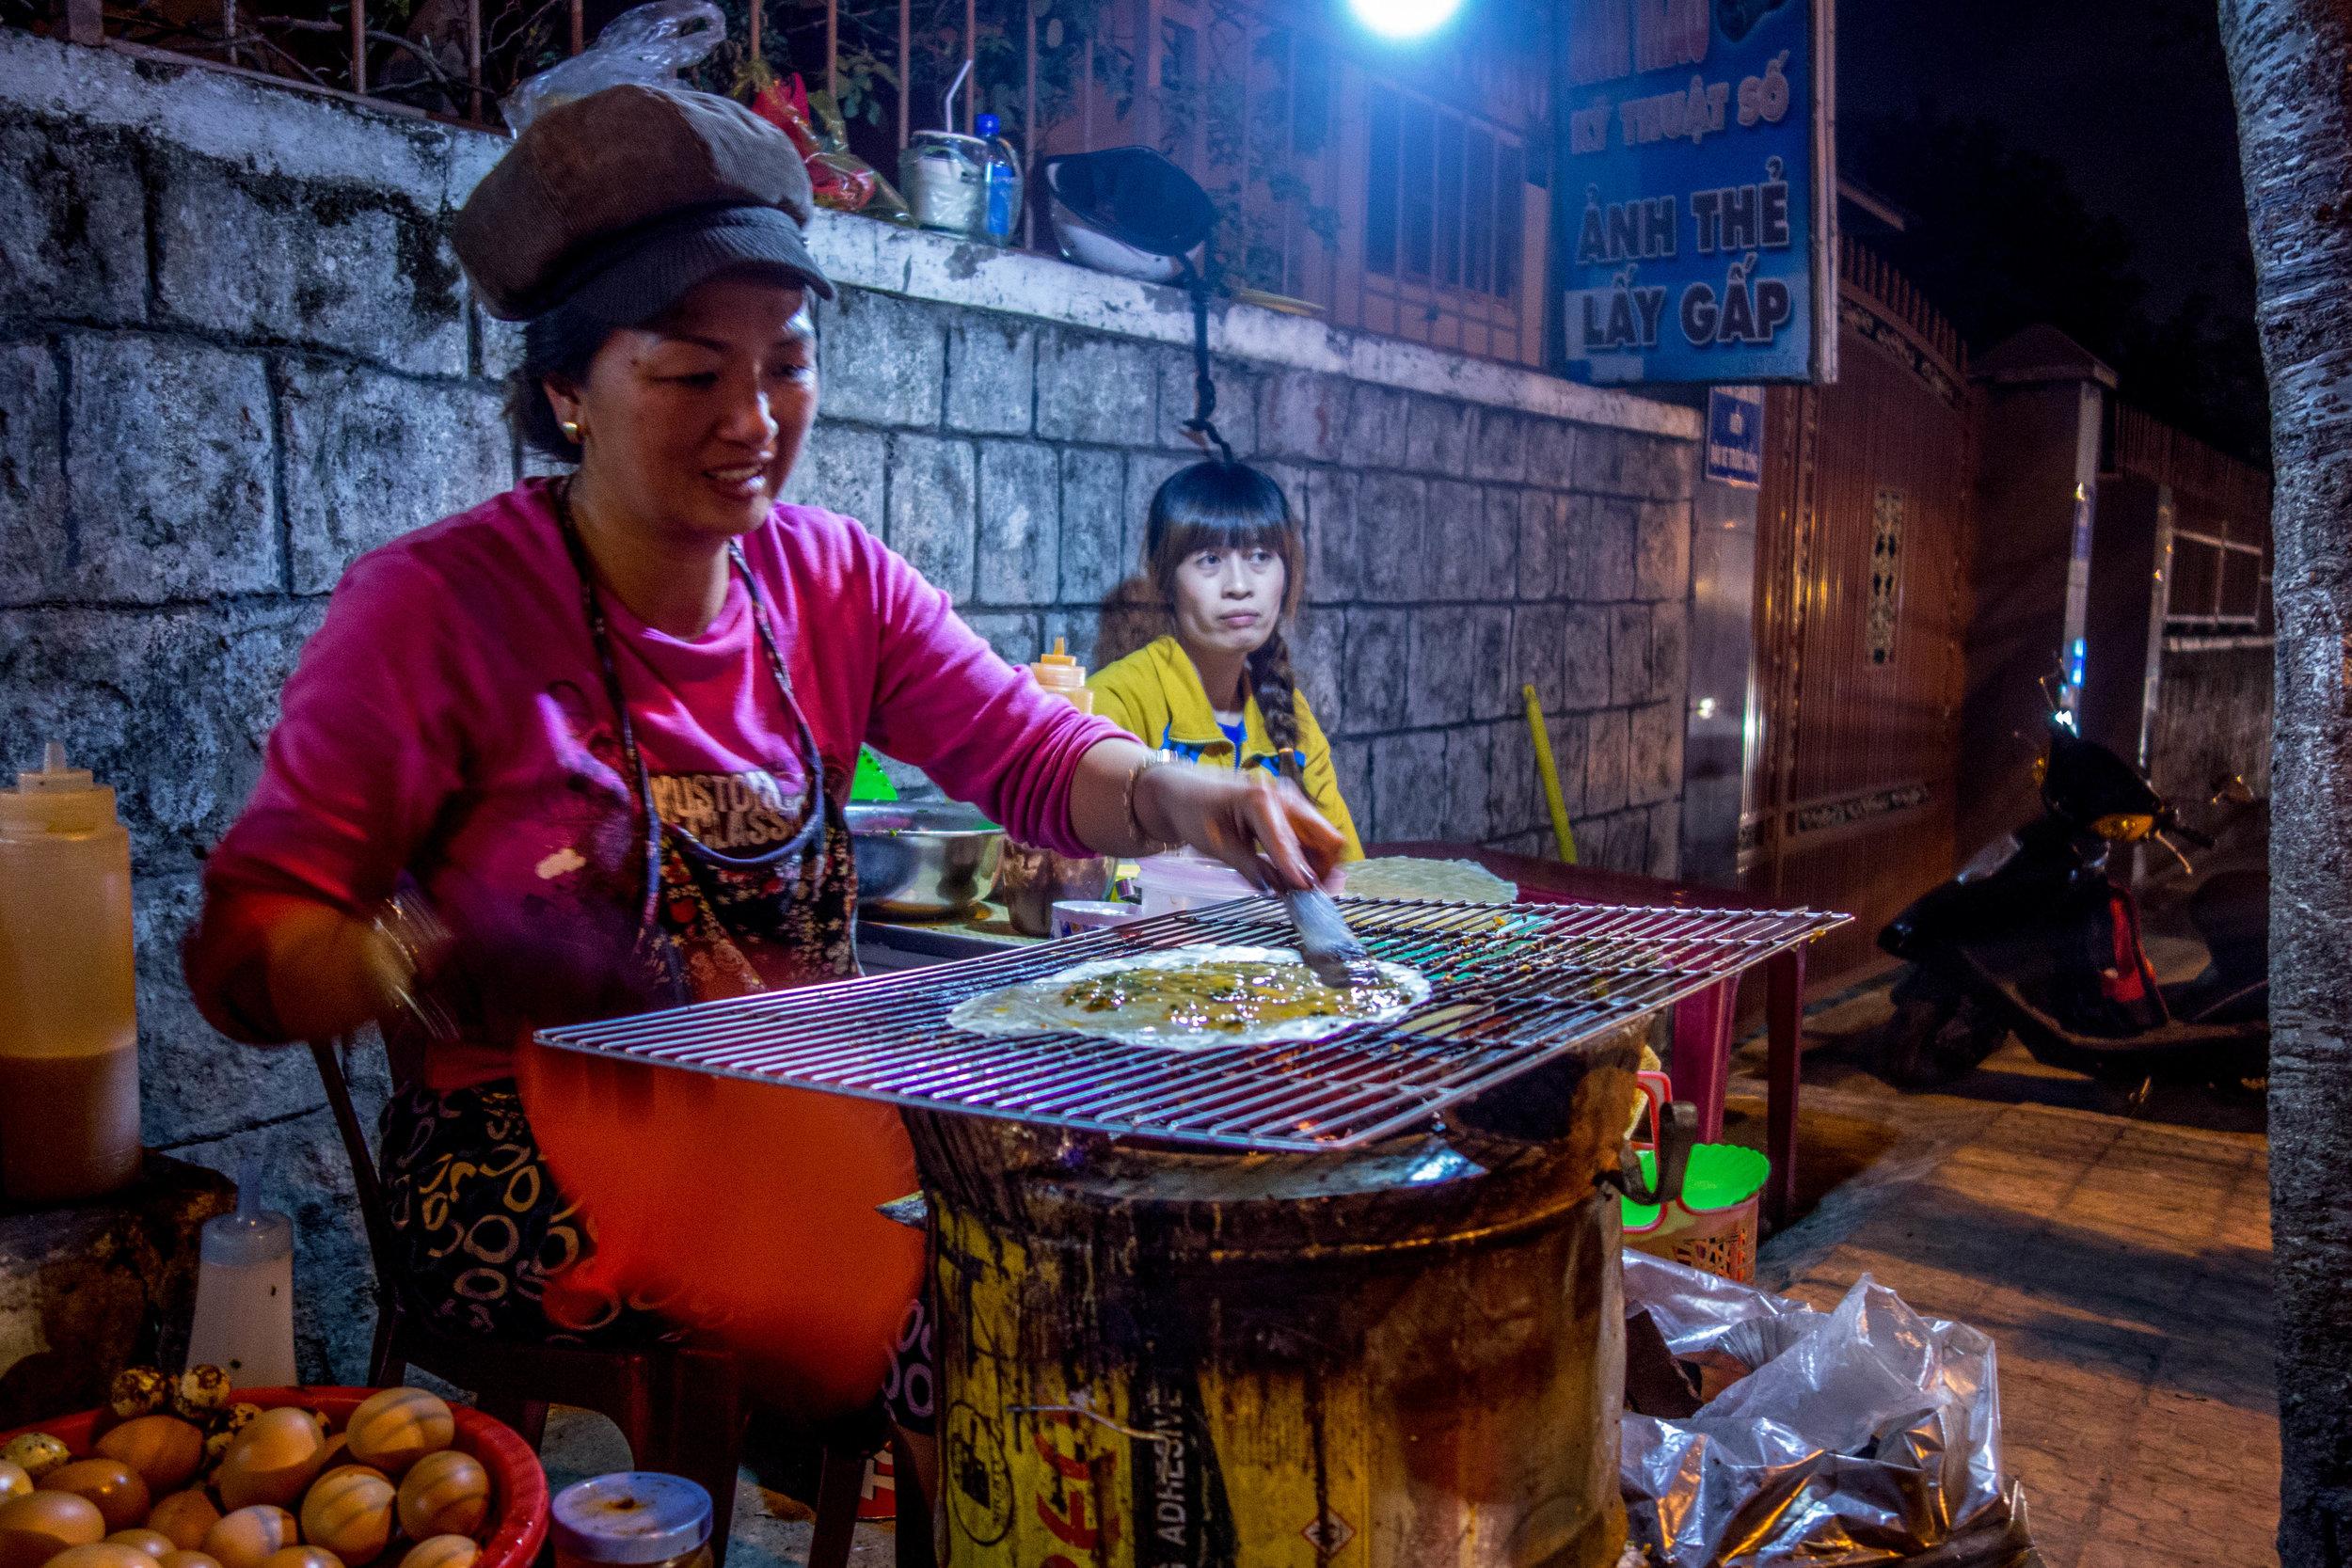 Street vendor making Da Lat pizza.